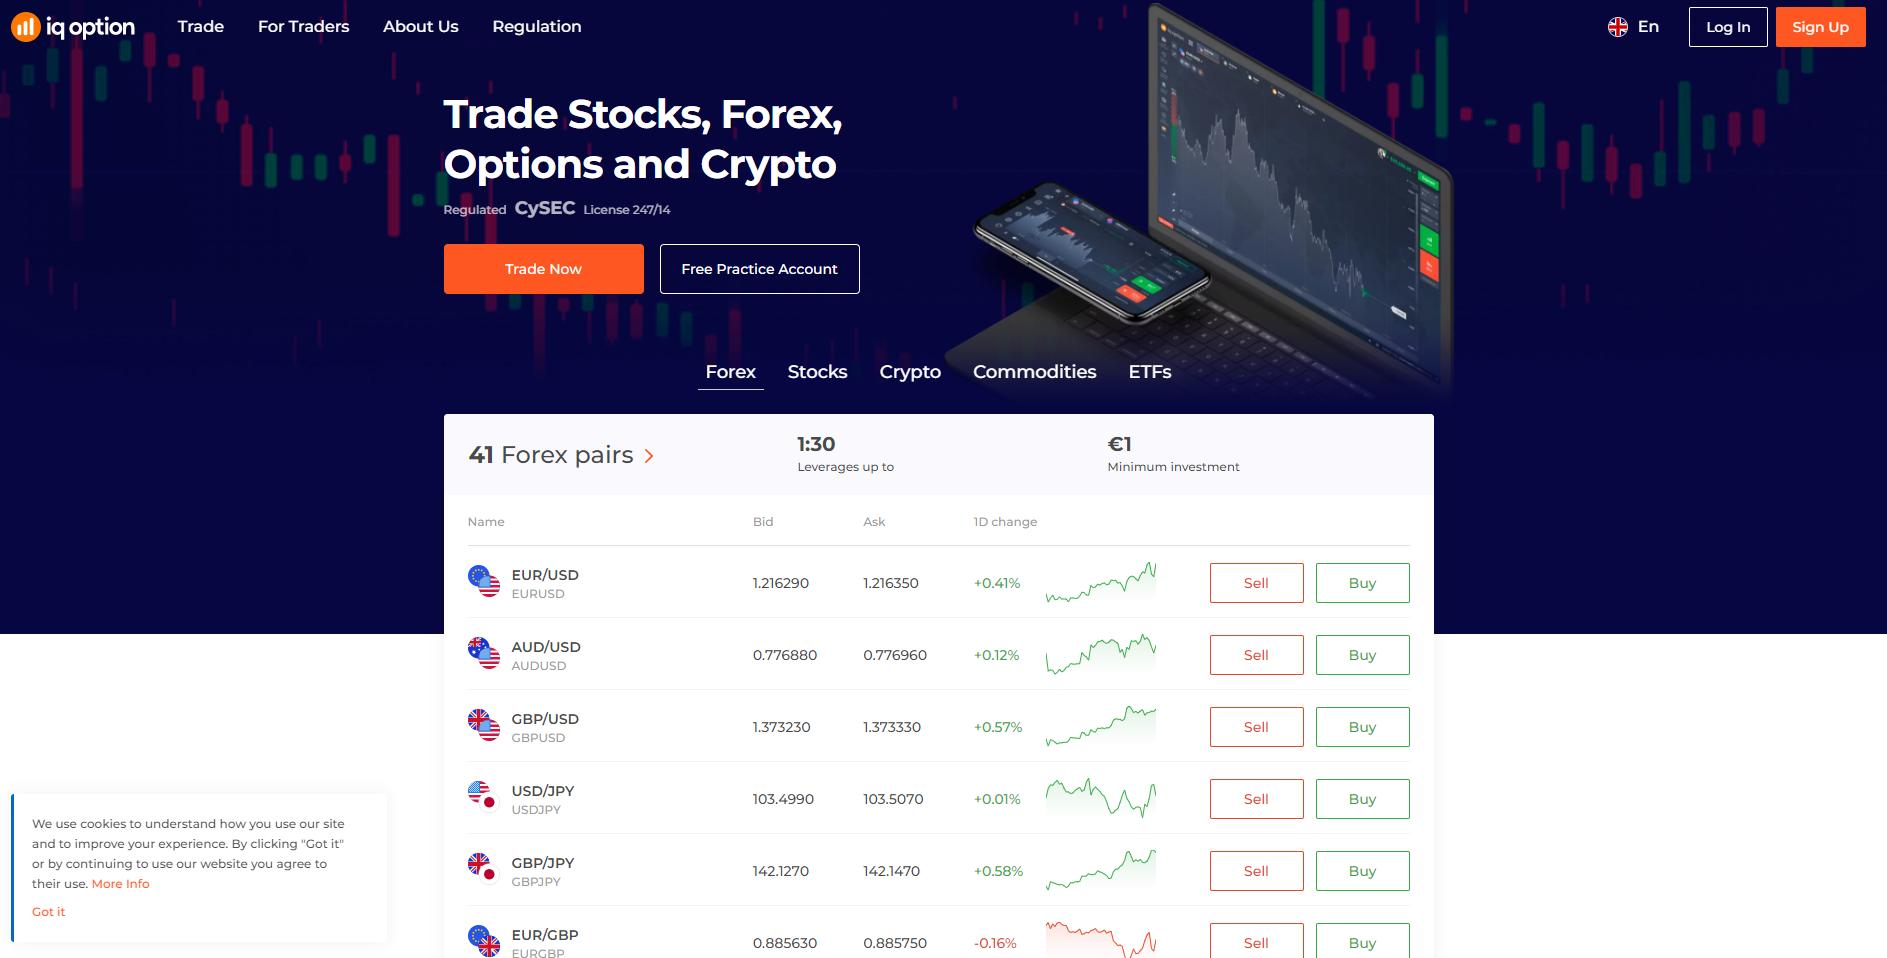 Official website of the broker IQ Option